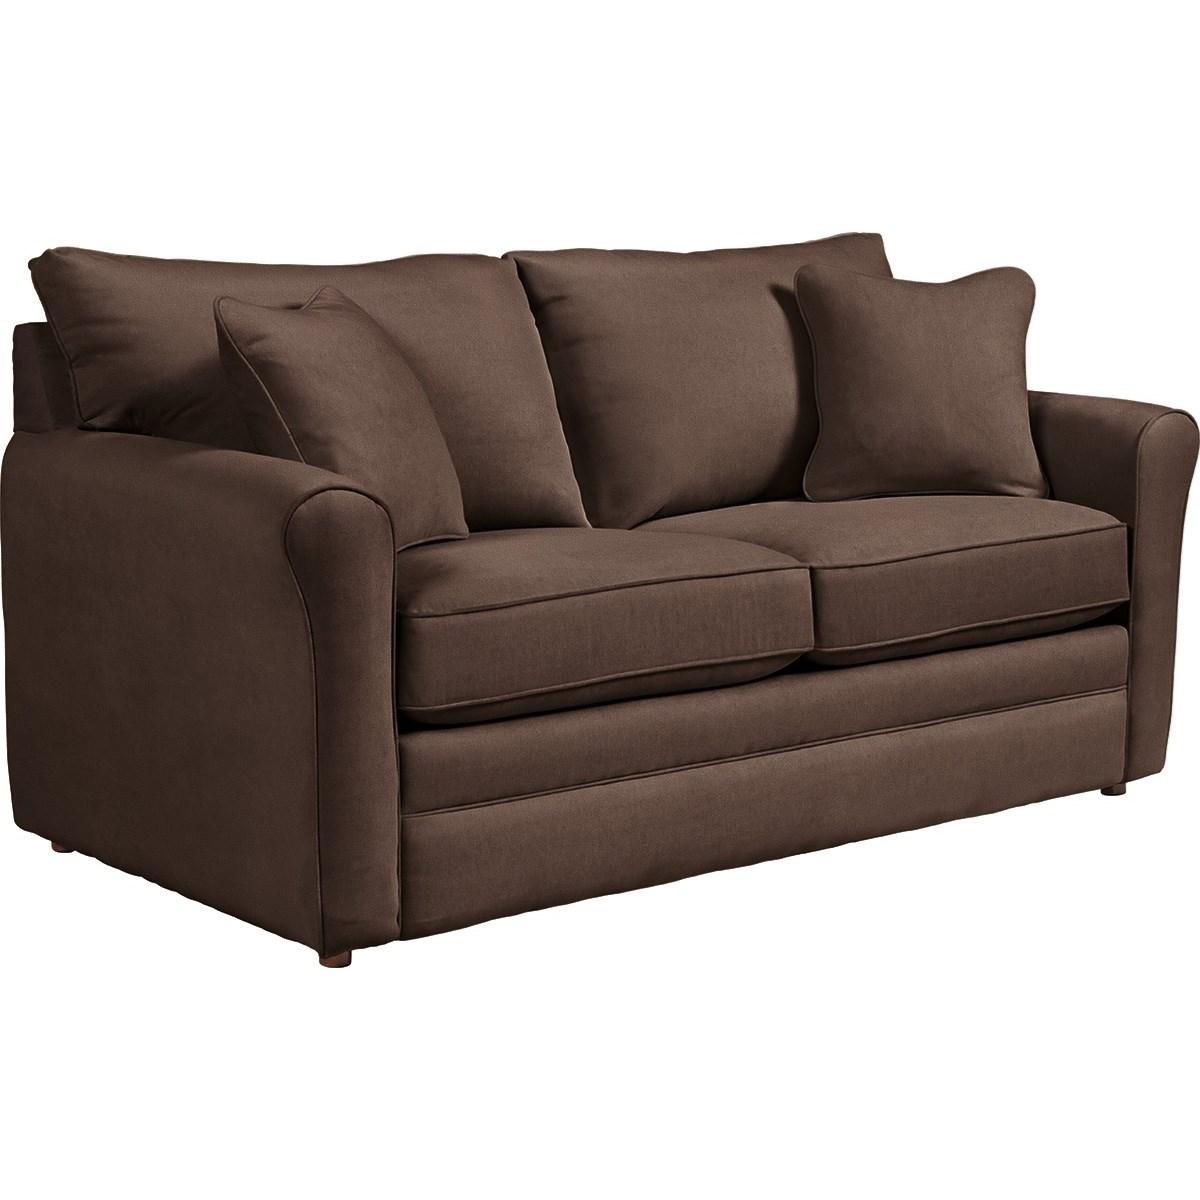 Leah Full Sleep Sofa w/ SlumberAir® Mattress by La-Z-Boy at Jordan's Home Furnishings